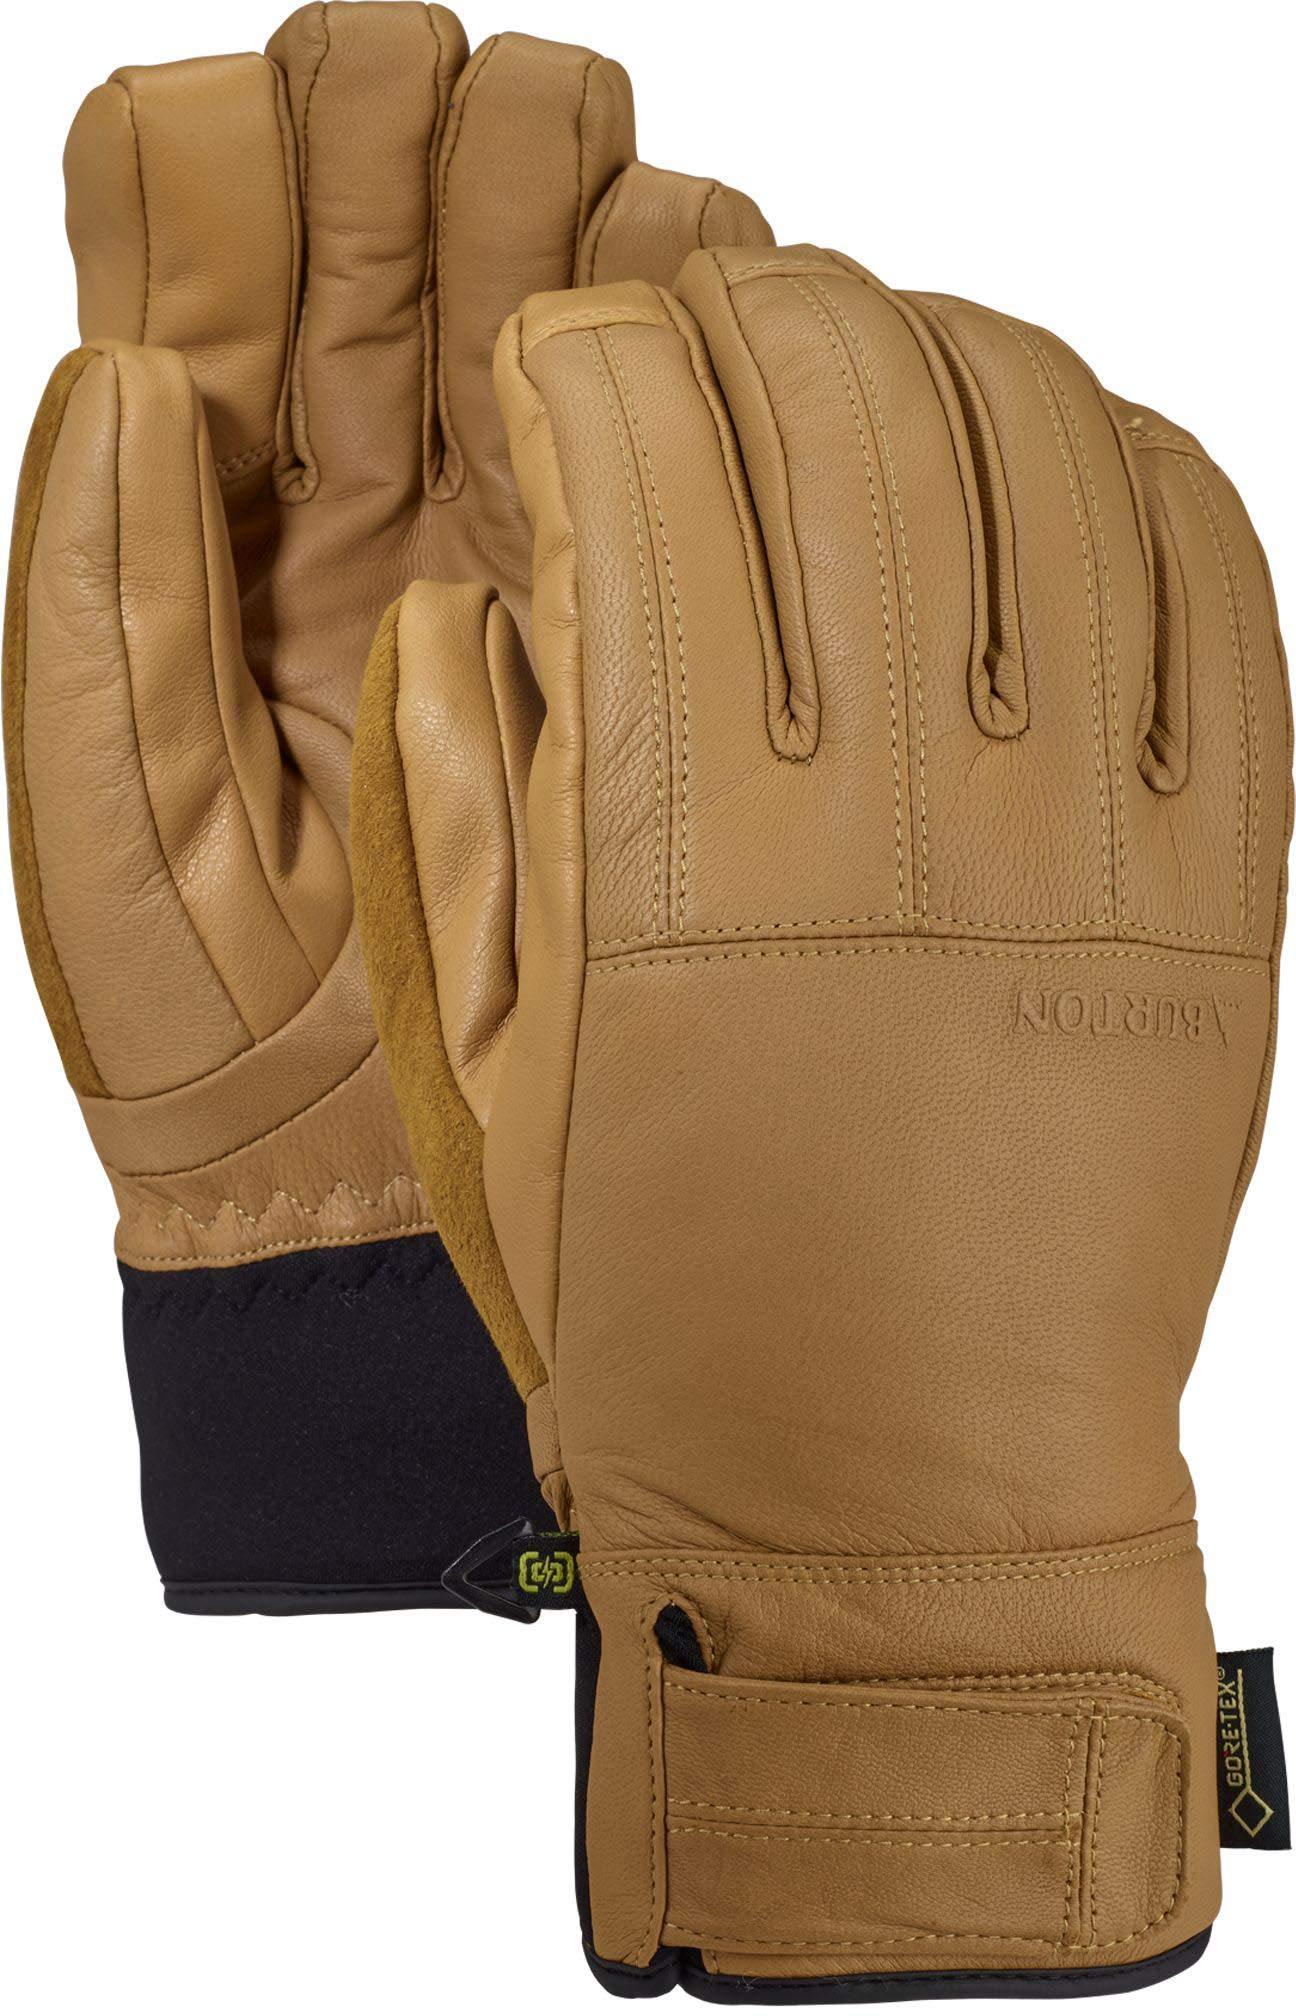 Burton Men's Gore-Tex Gondy Leather Glove, Raw Hide, Large